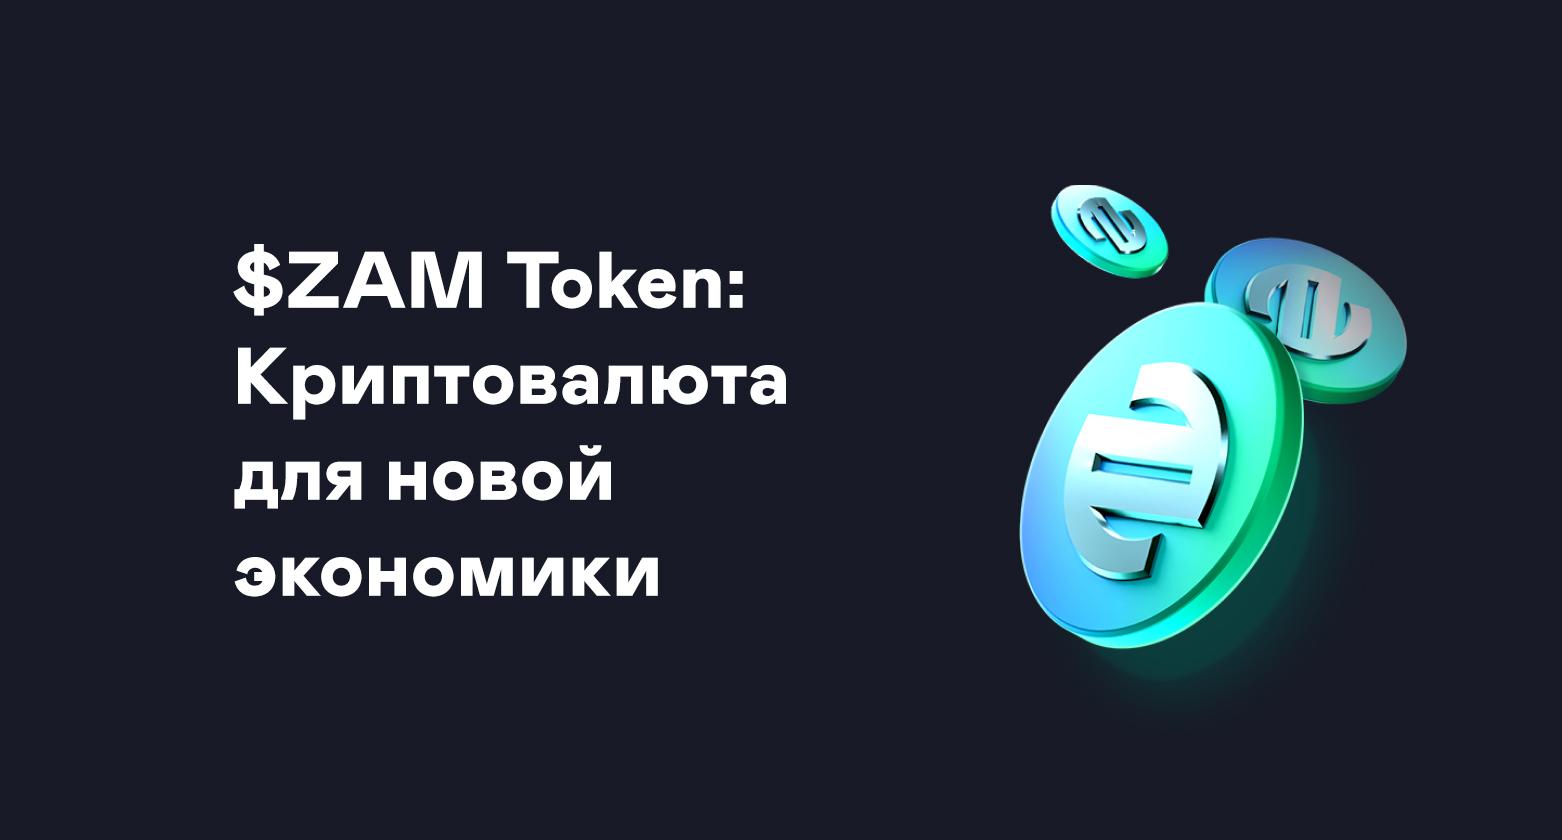 what is the zam token - Как токен $ZAM облегчит переход реального капитала в блокчейн